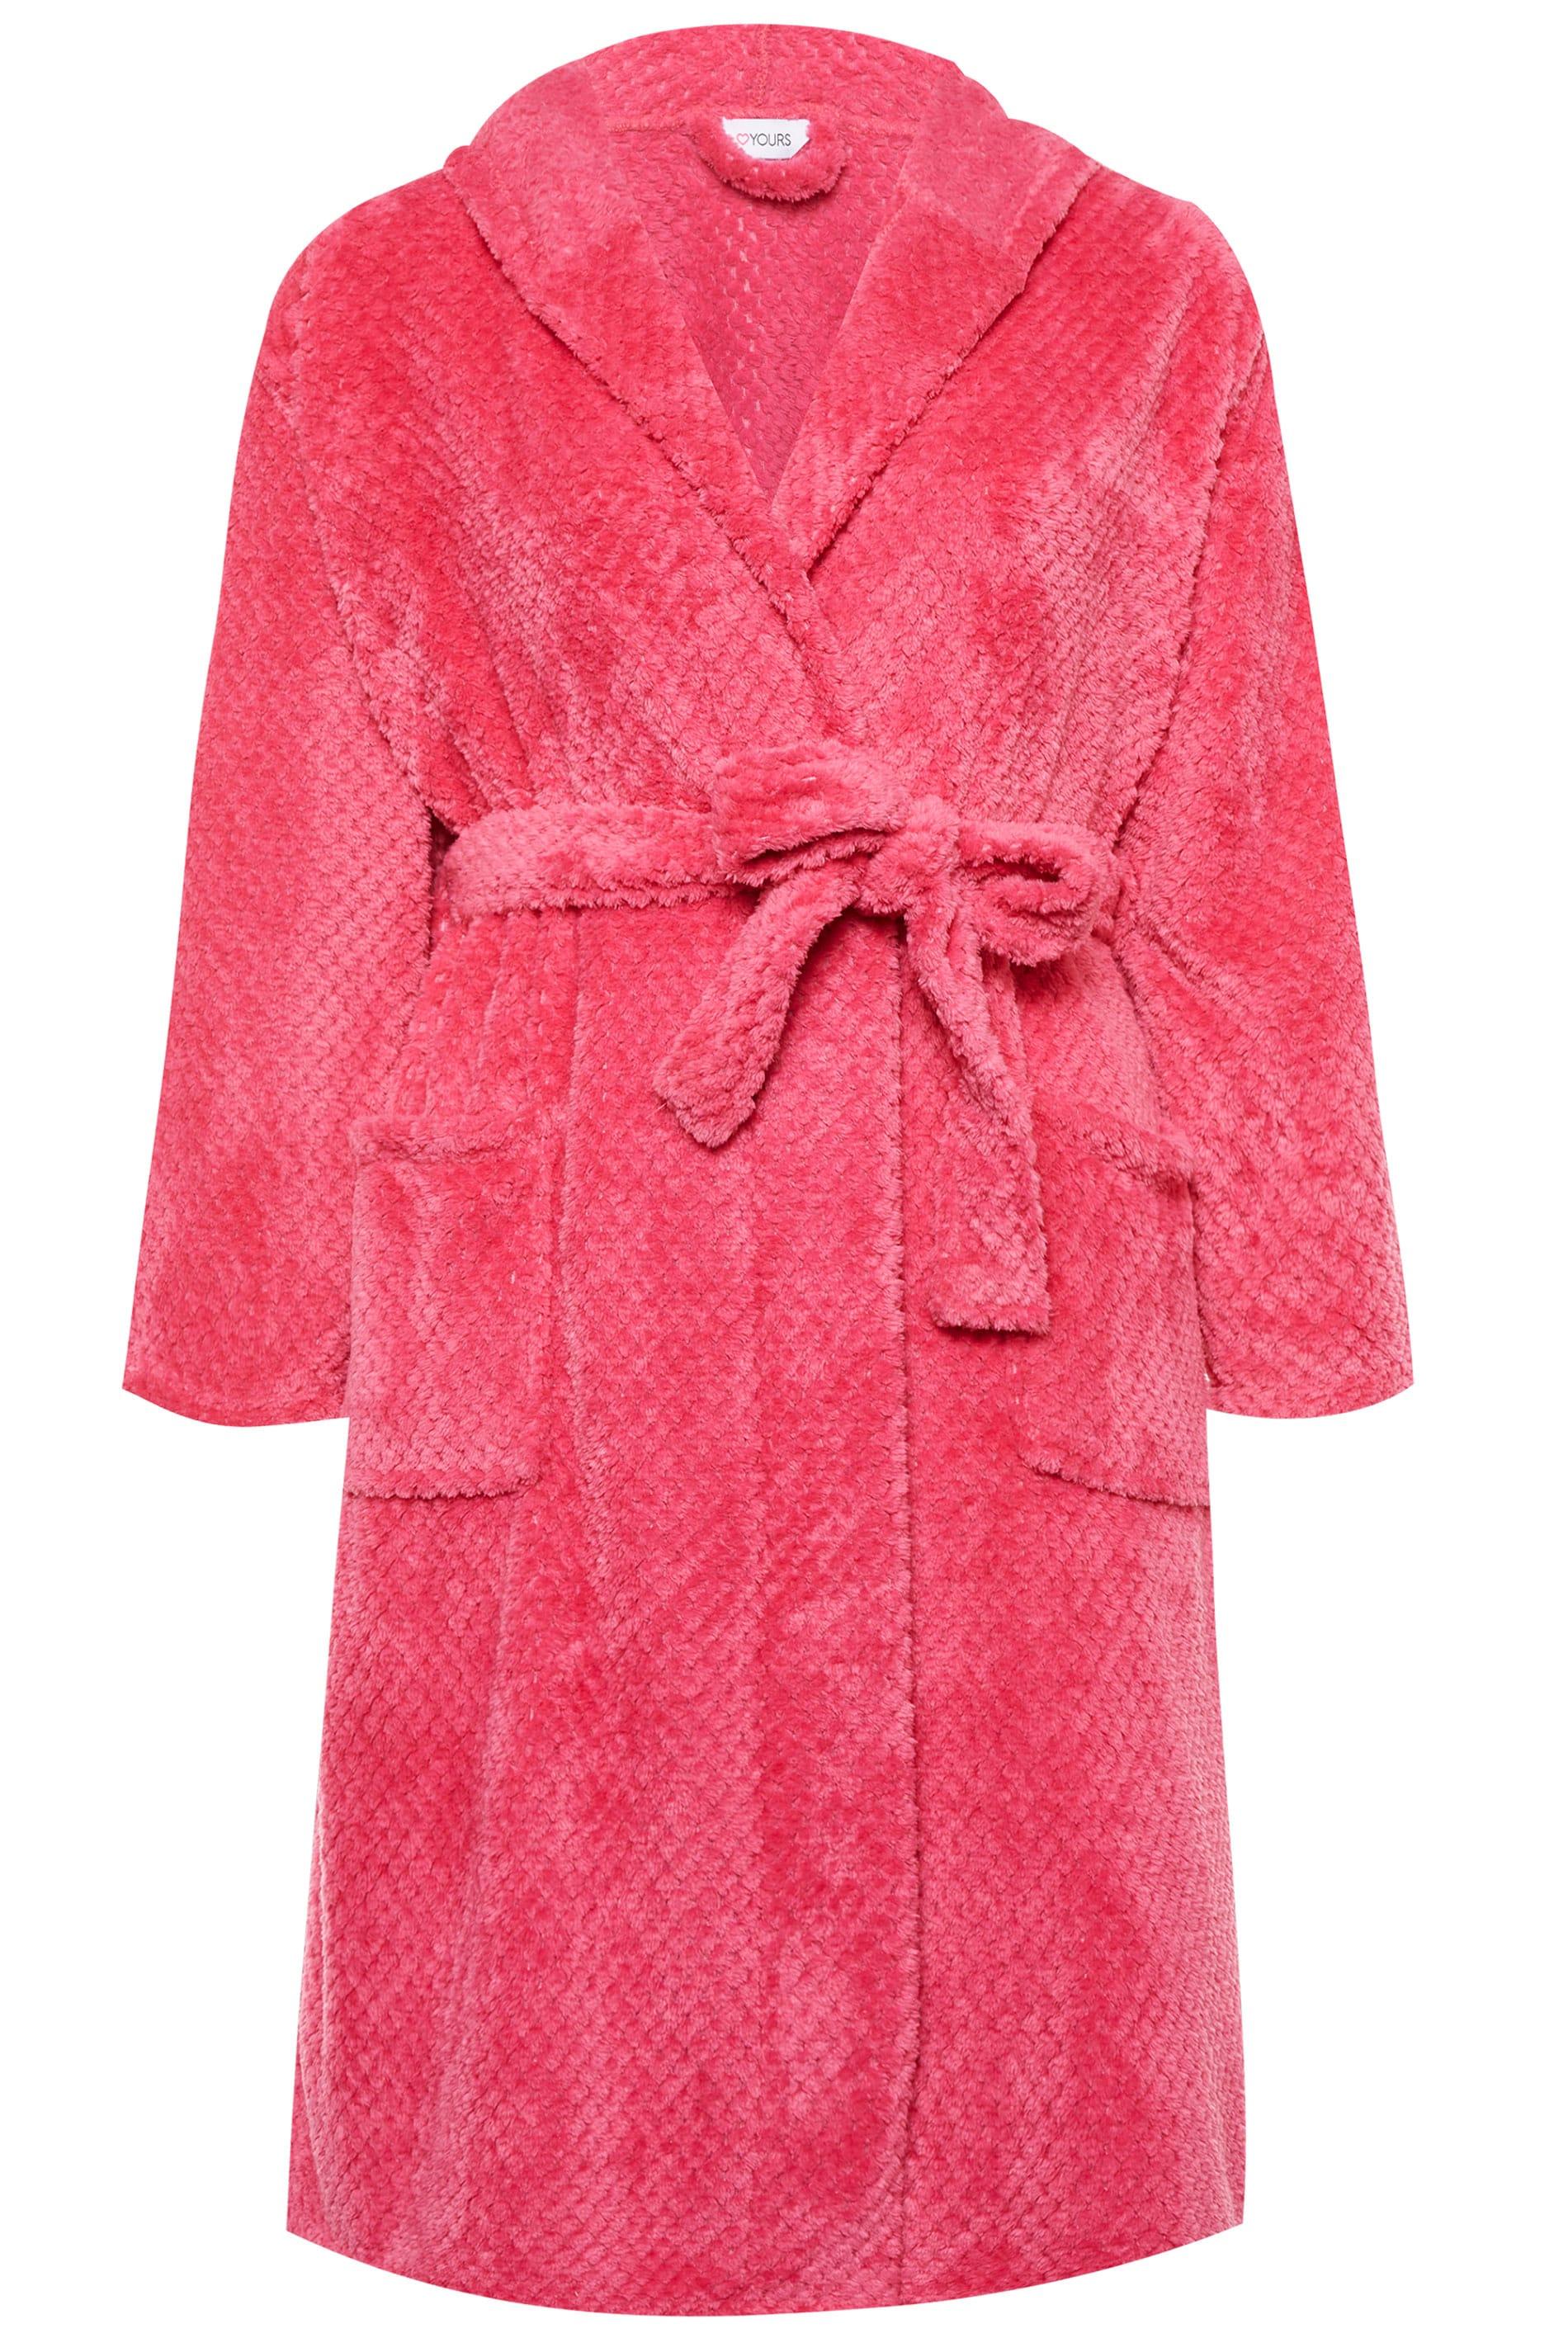 morgenmantel in waffel stoff pink. Black Bedroom Furniture Sets. Home Design Ideas